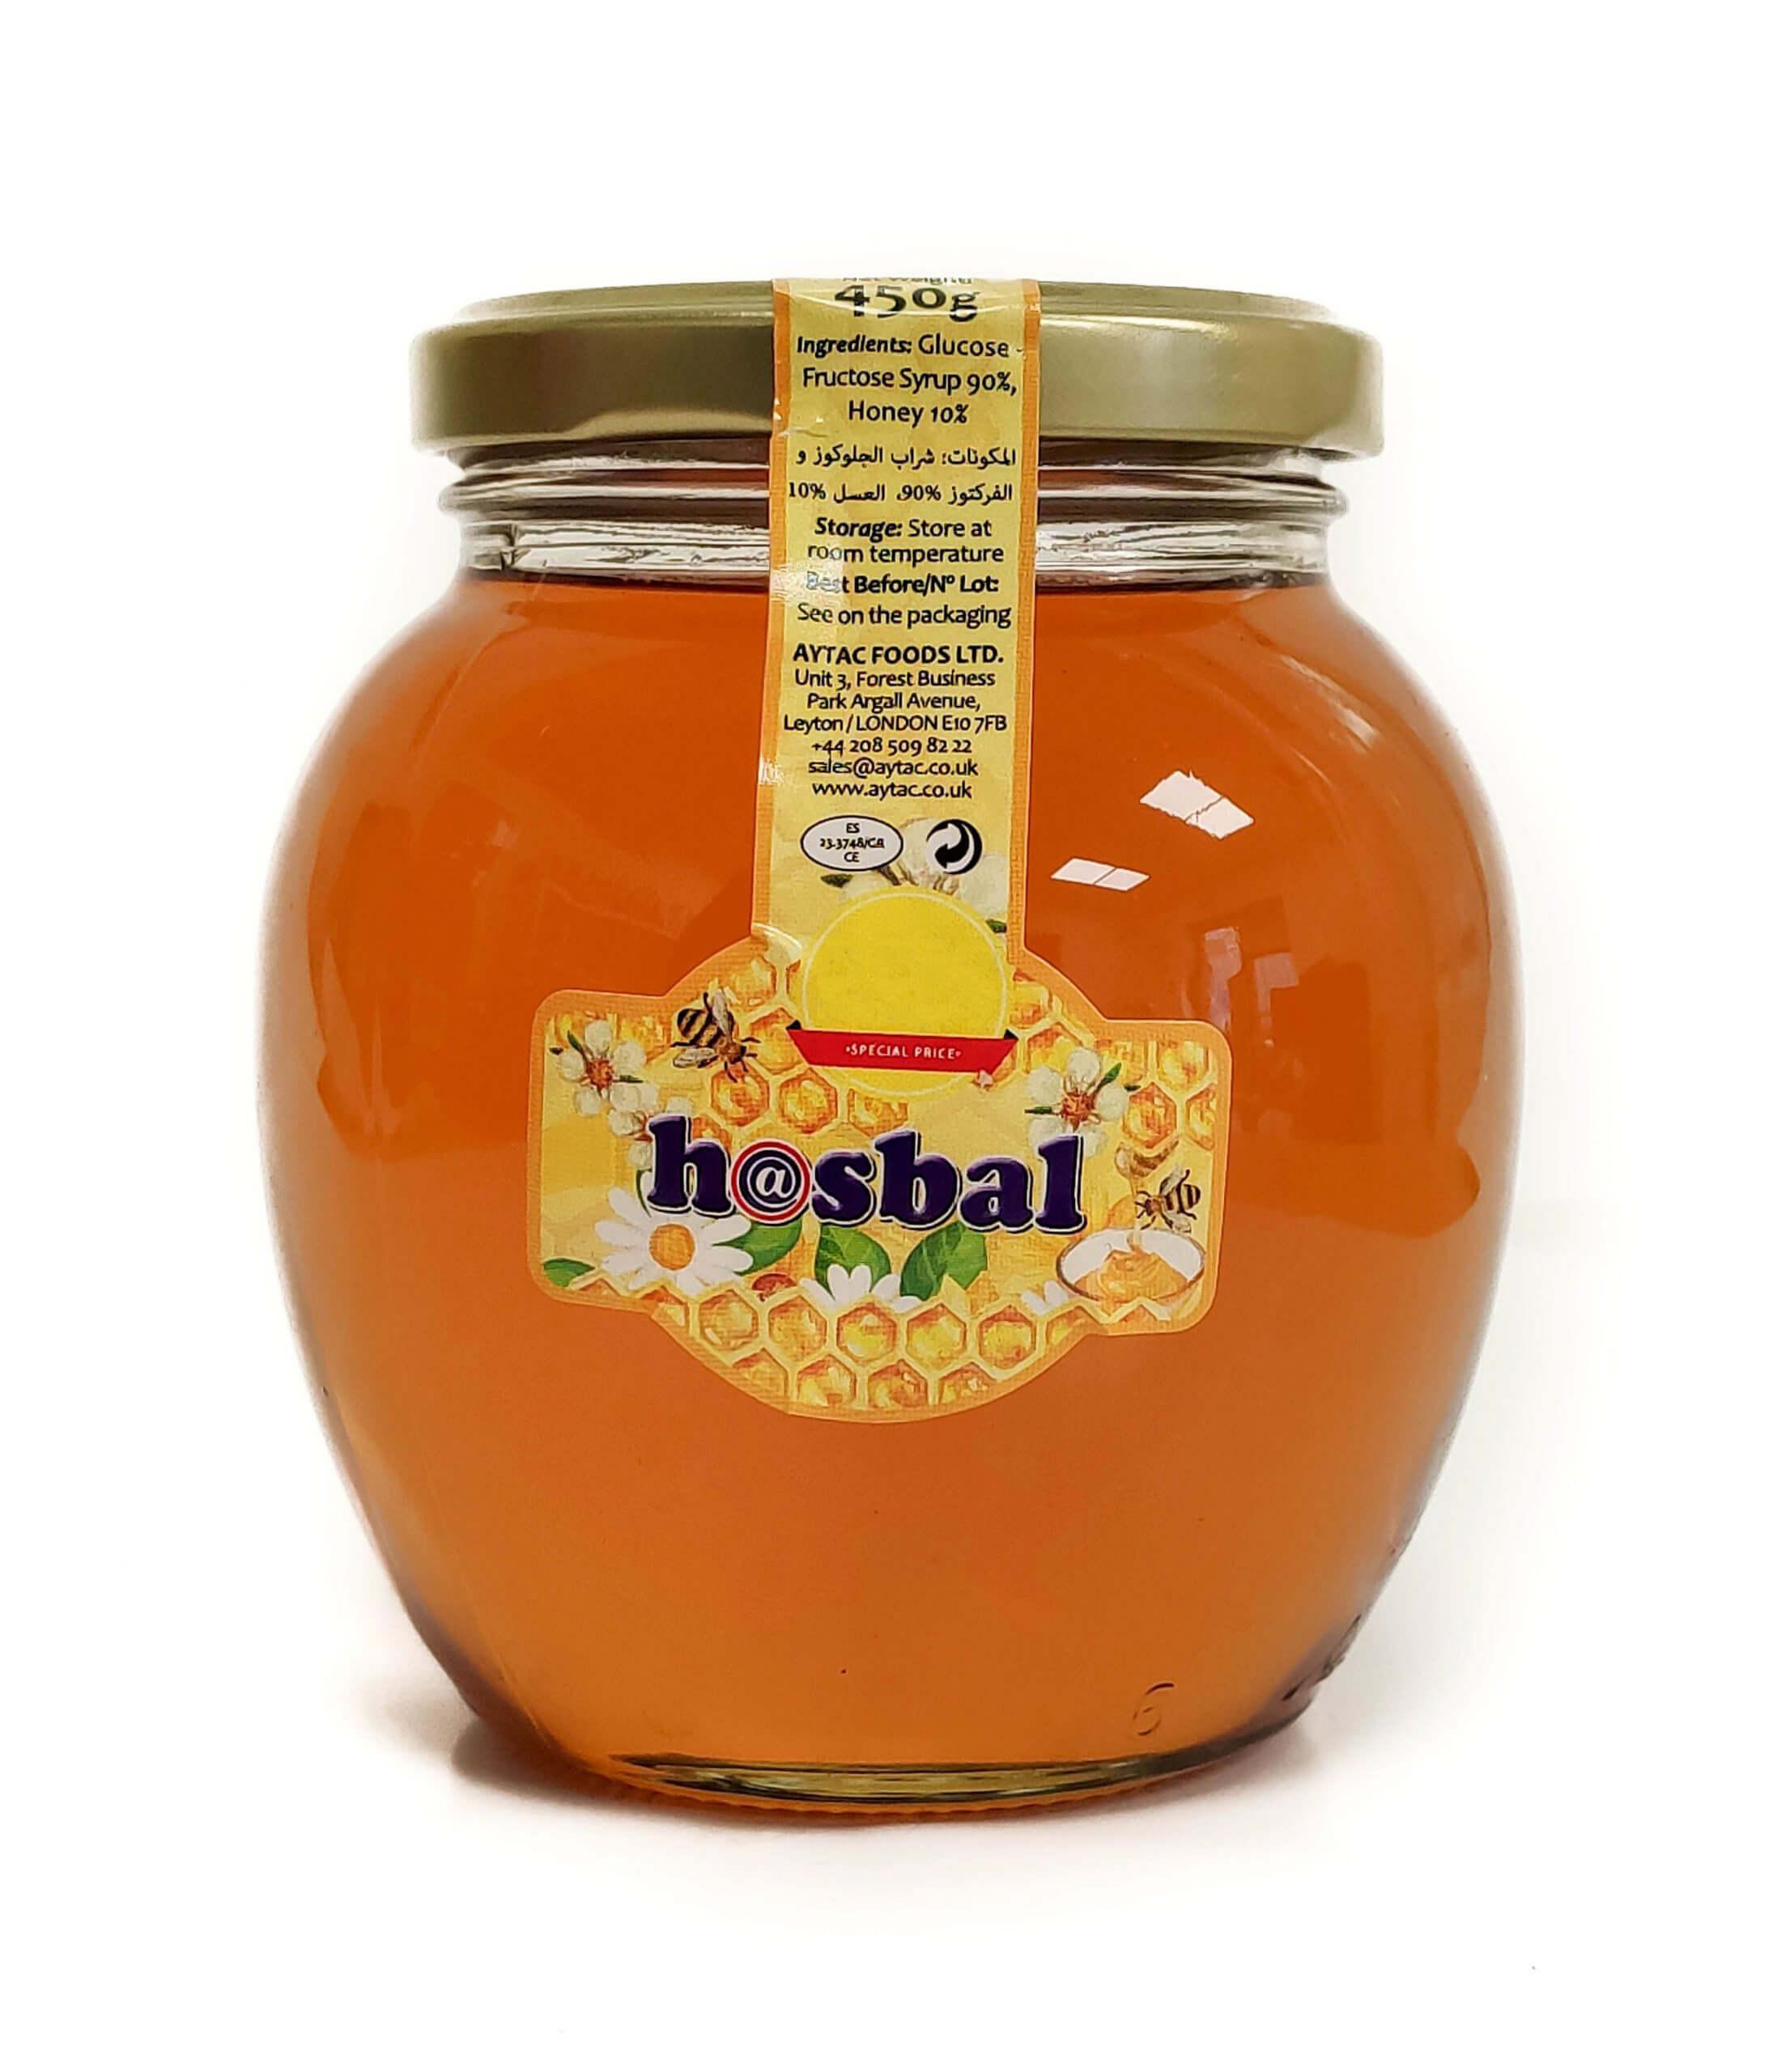 32370-hasbal-syrup-with-honey.jpg